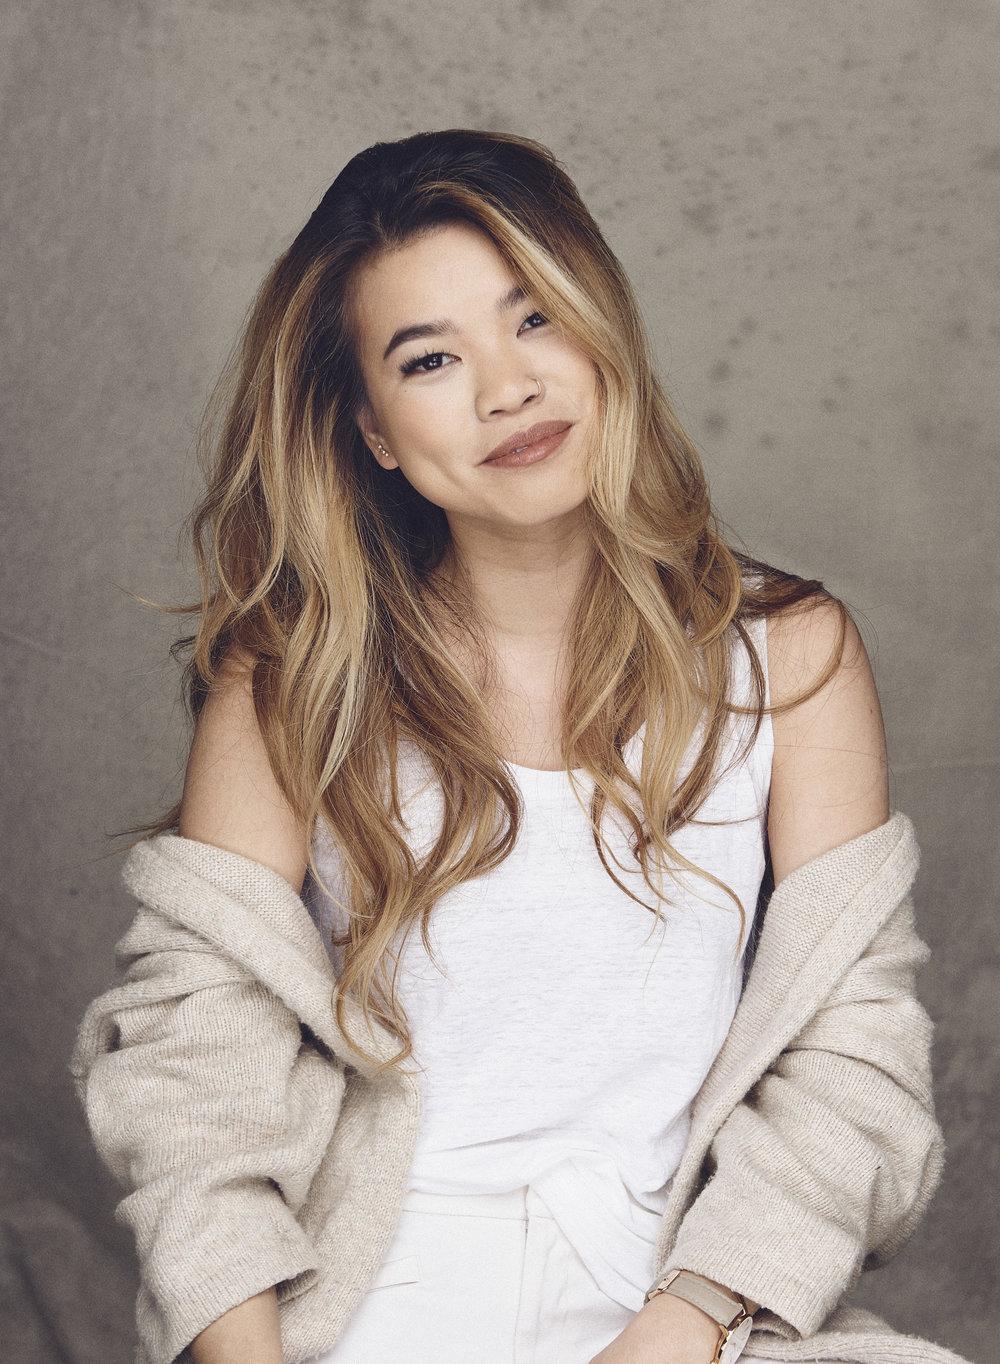 Chloe Hall Wen